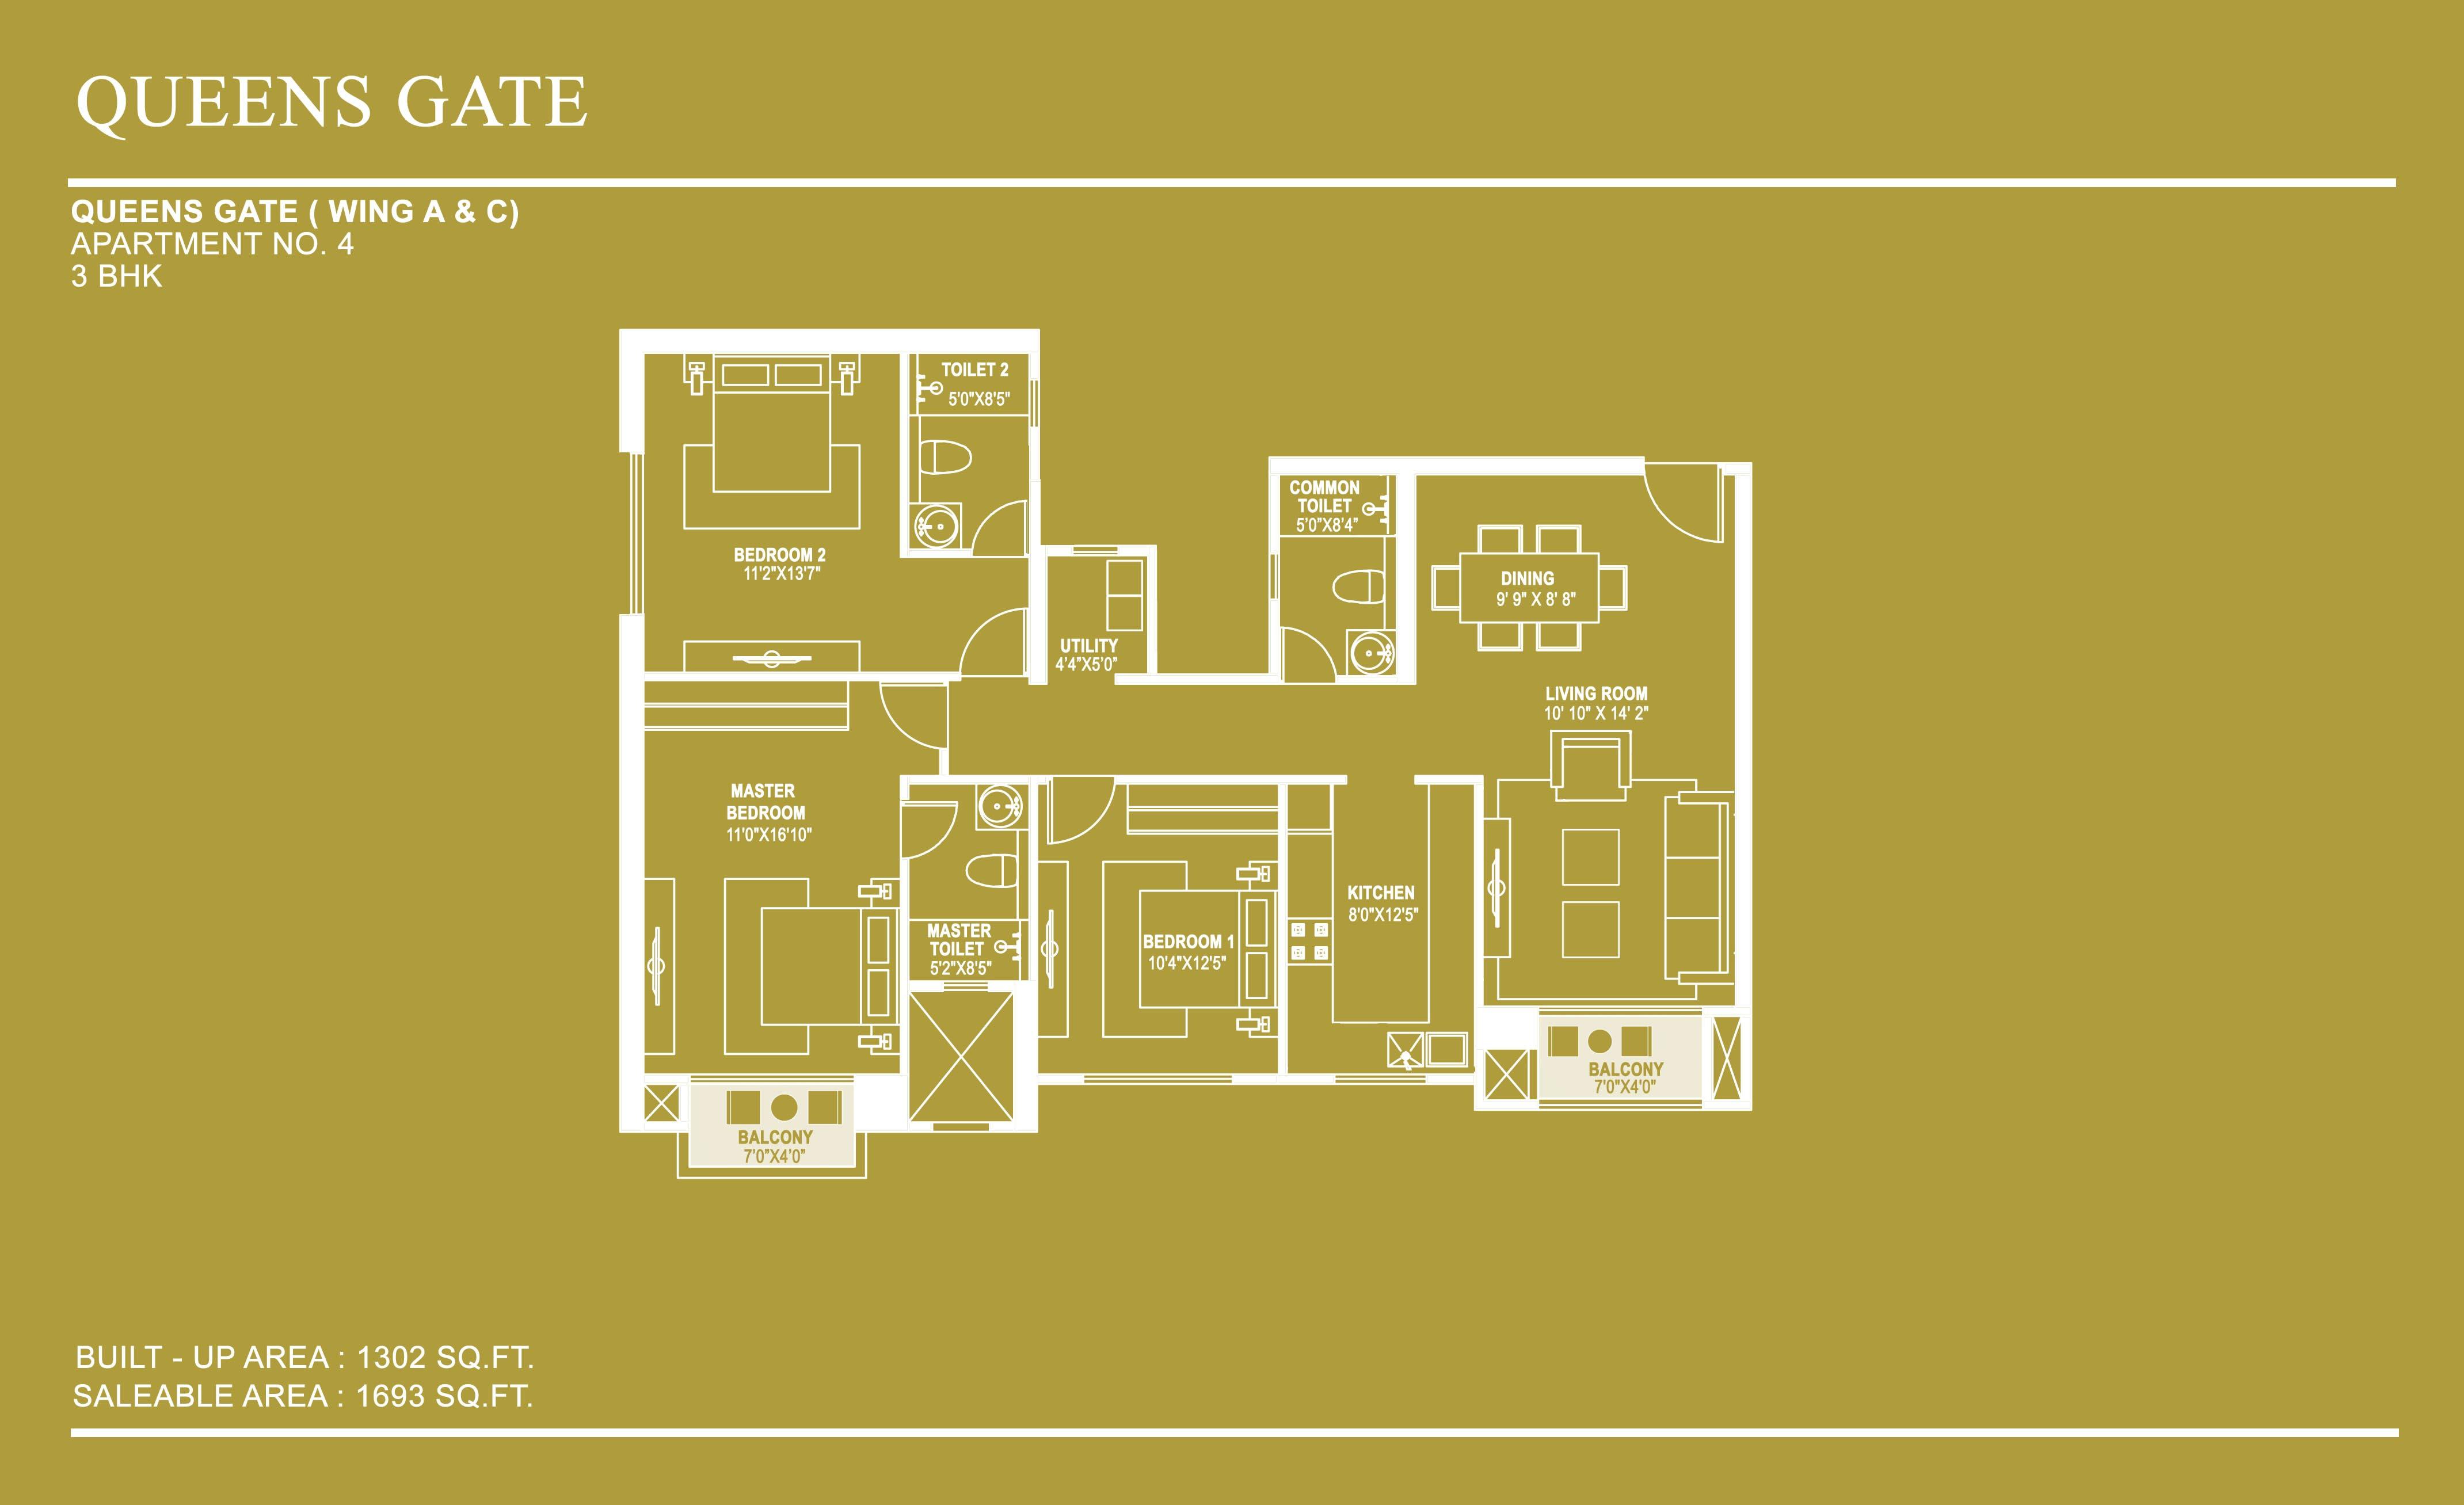 hiranandani queensgate apartment 3bhk 1693sqft1